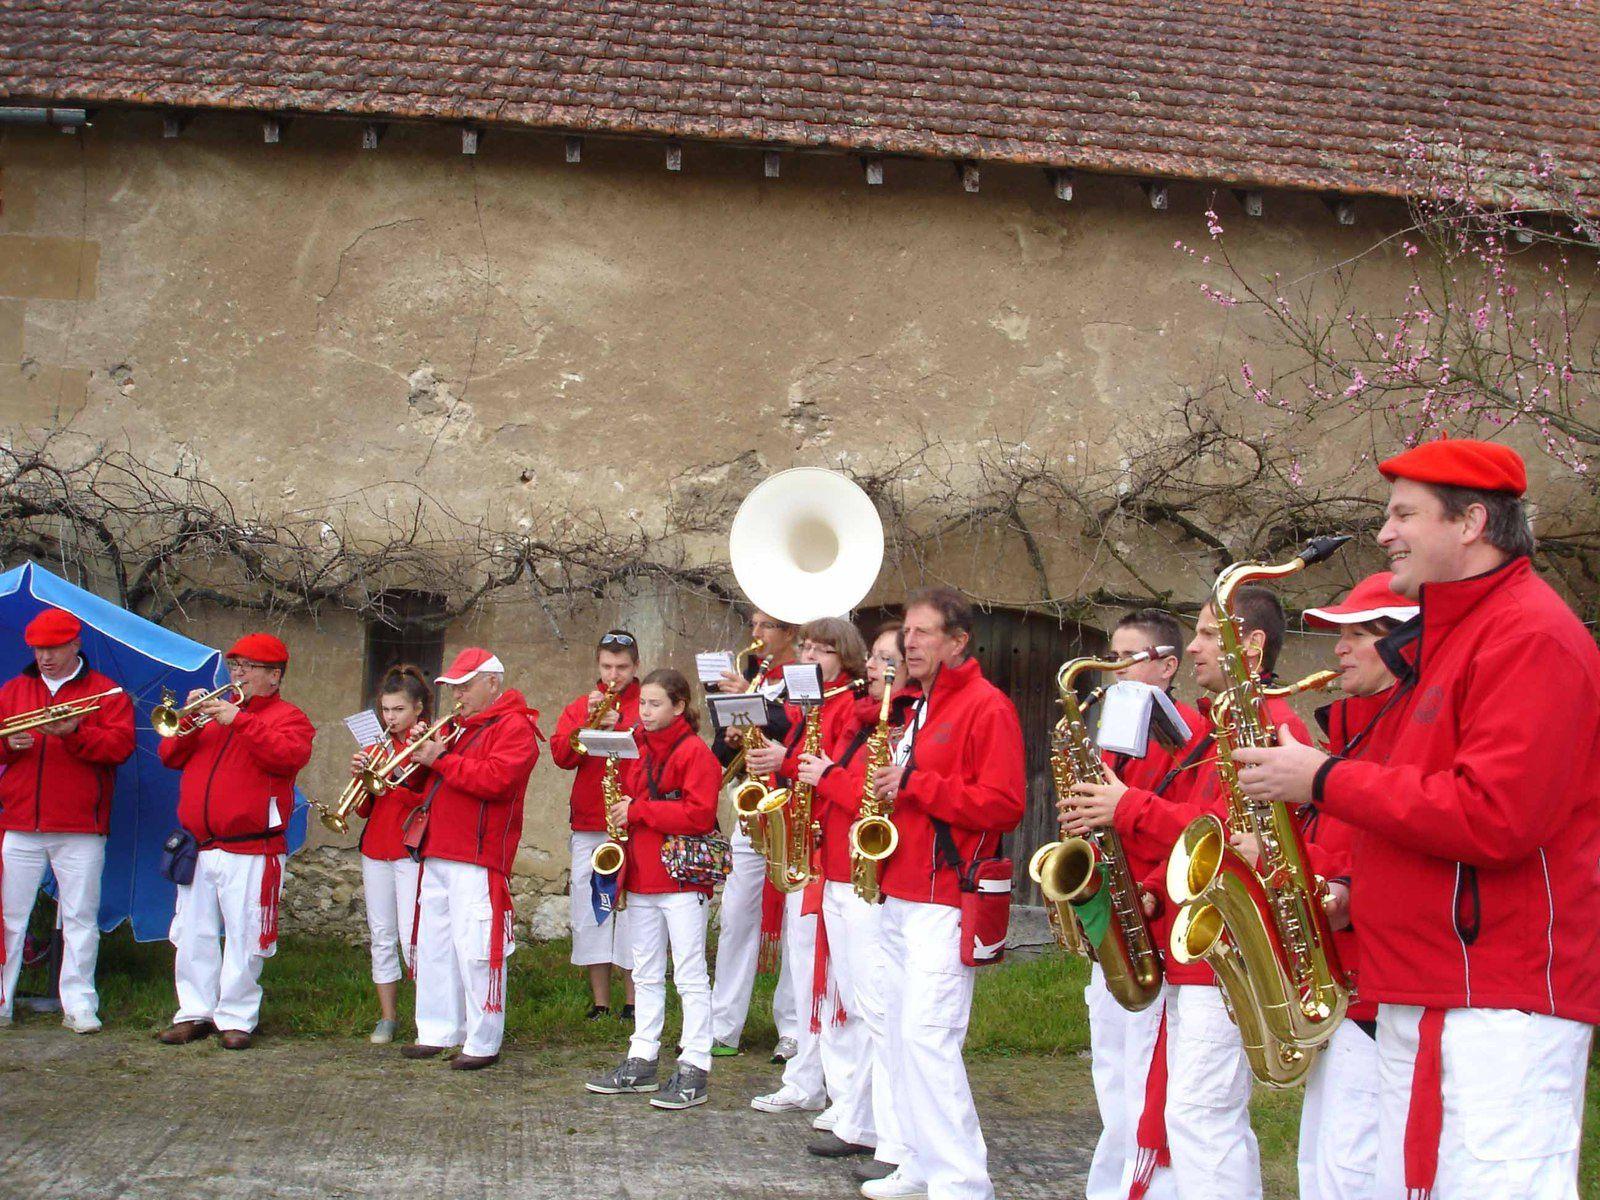 2014 - St Germain et Mons